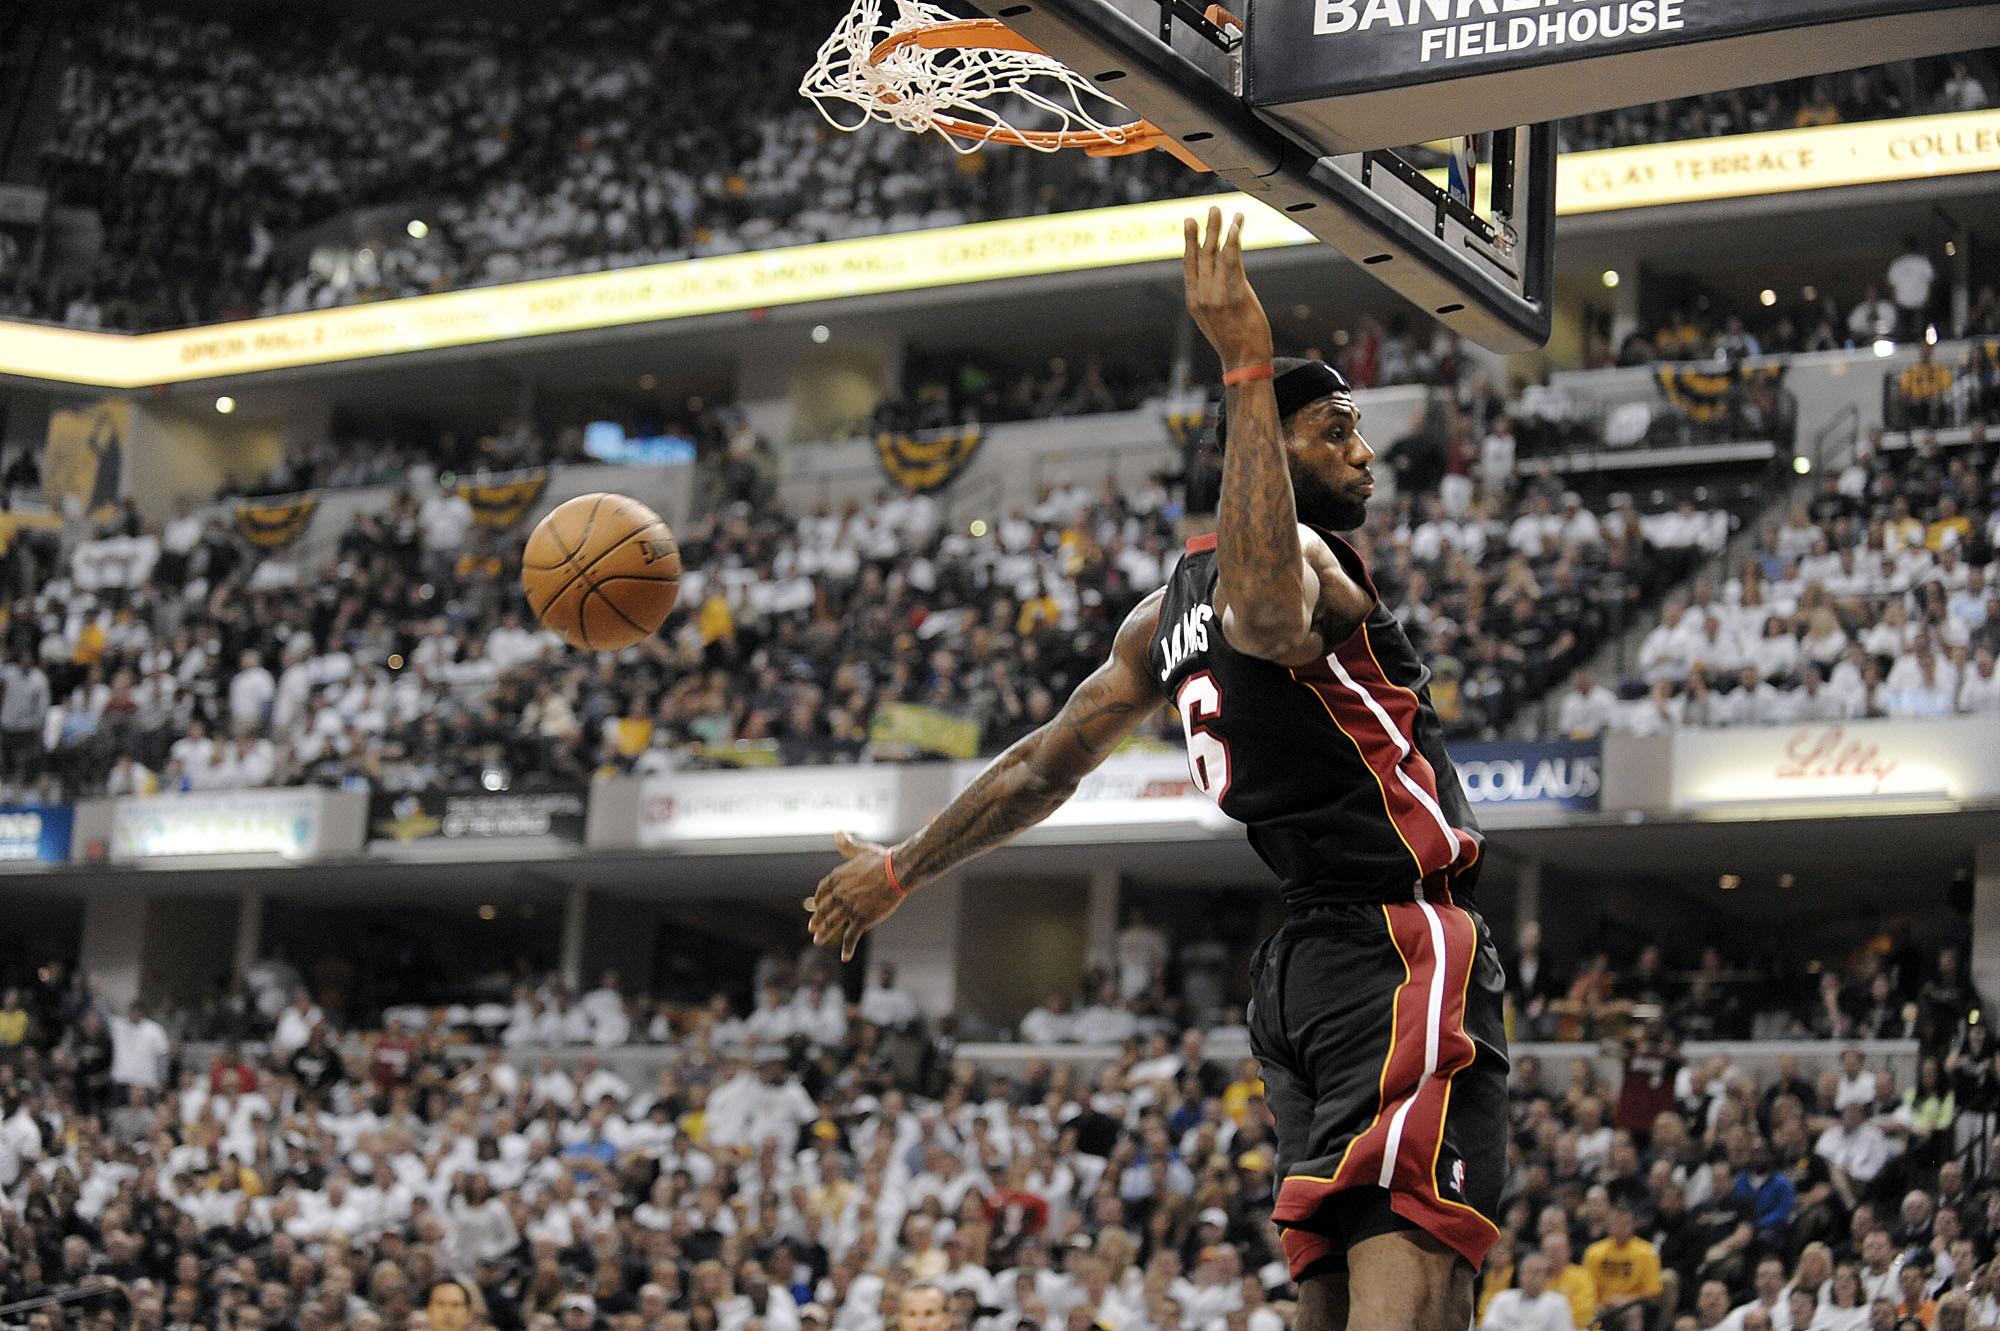 Photos: Heat - Pacers, Game 3 - southflorida.com